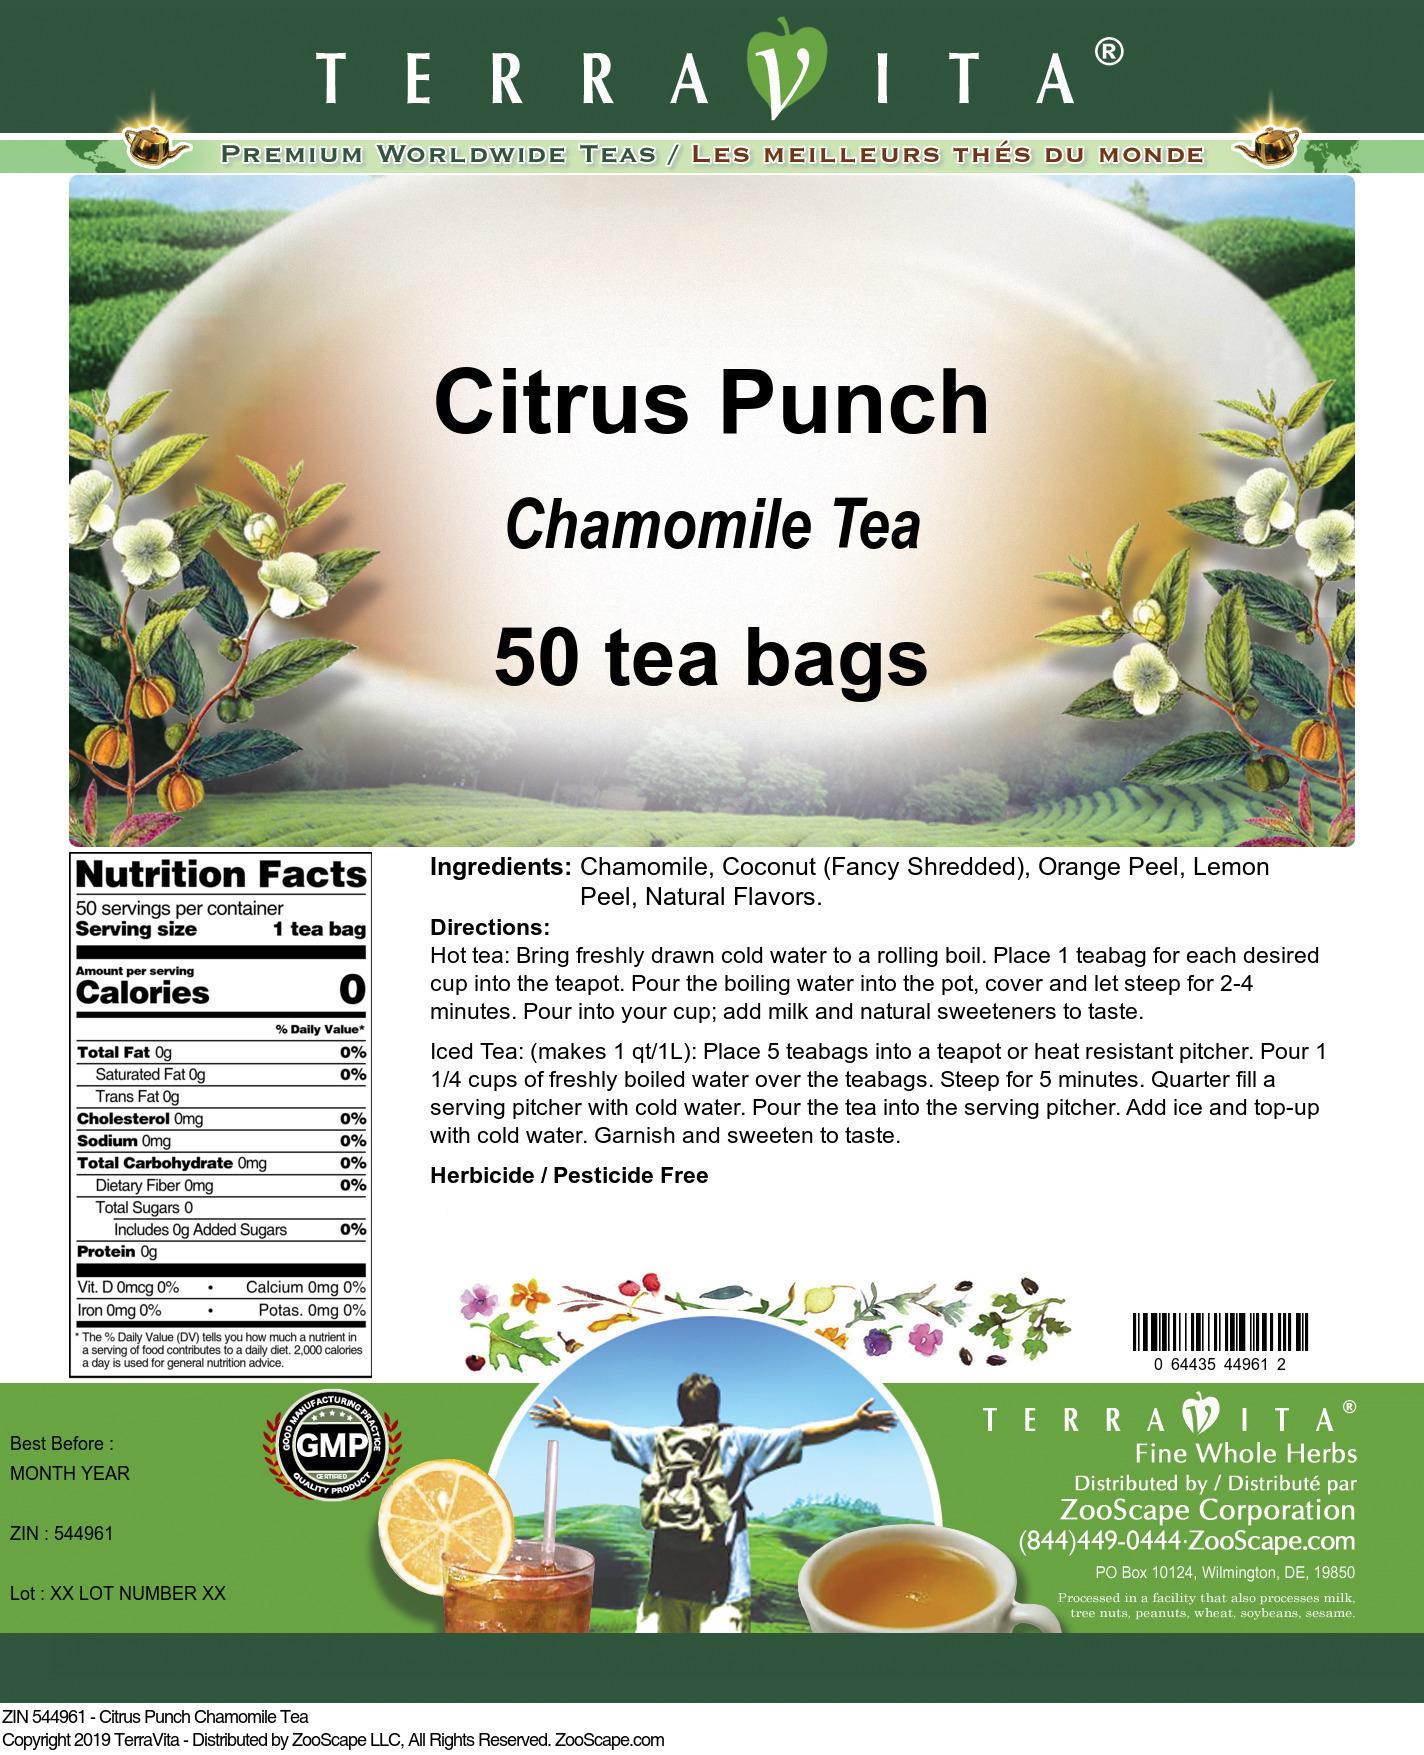 Citrus Punch Chamomile Tea